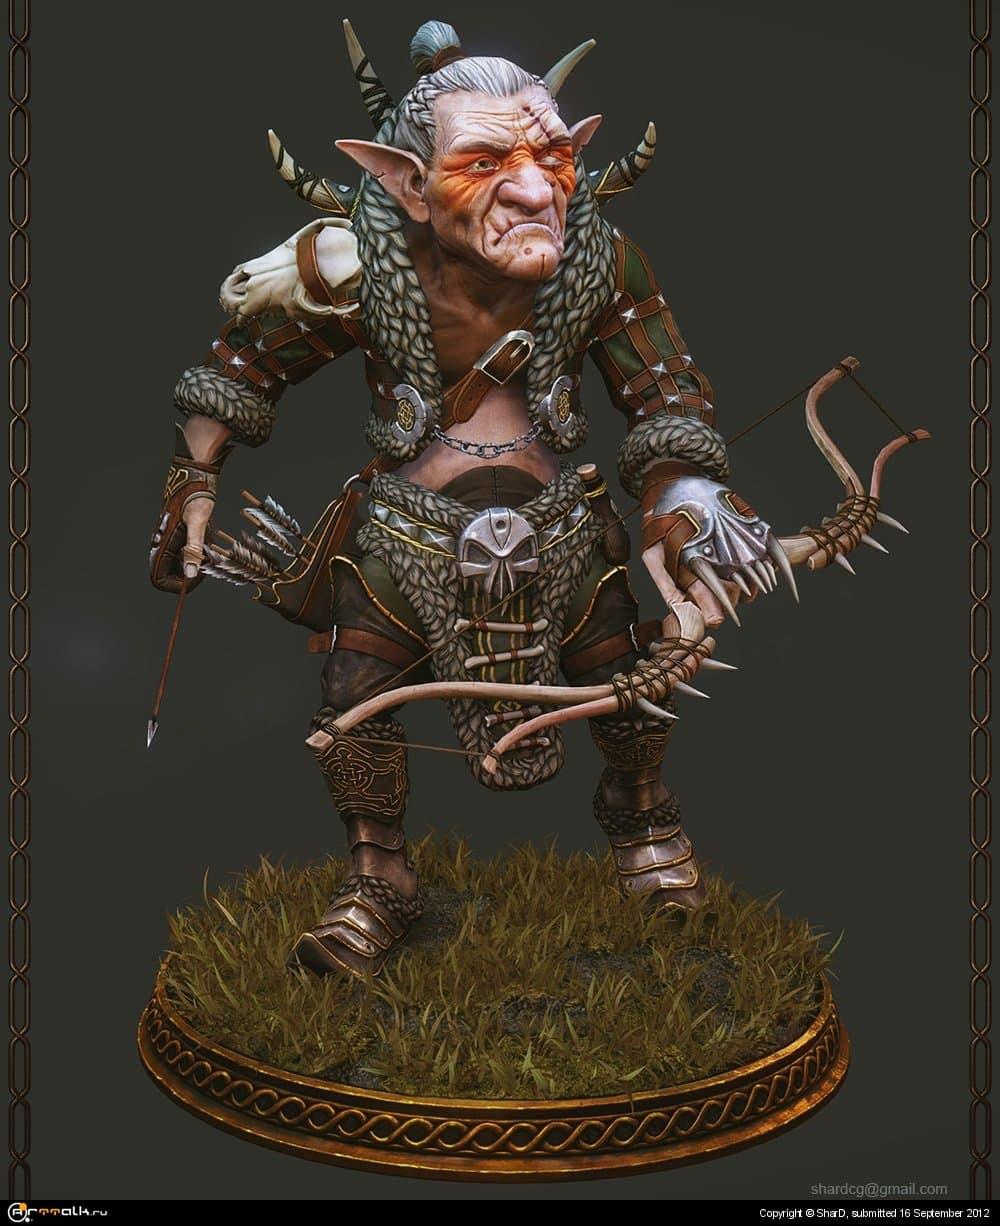 Goblin Archer, Mixamo Fantasy War Character Modeling Contest